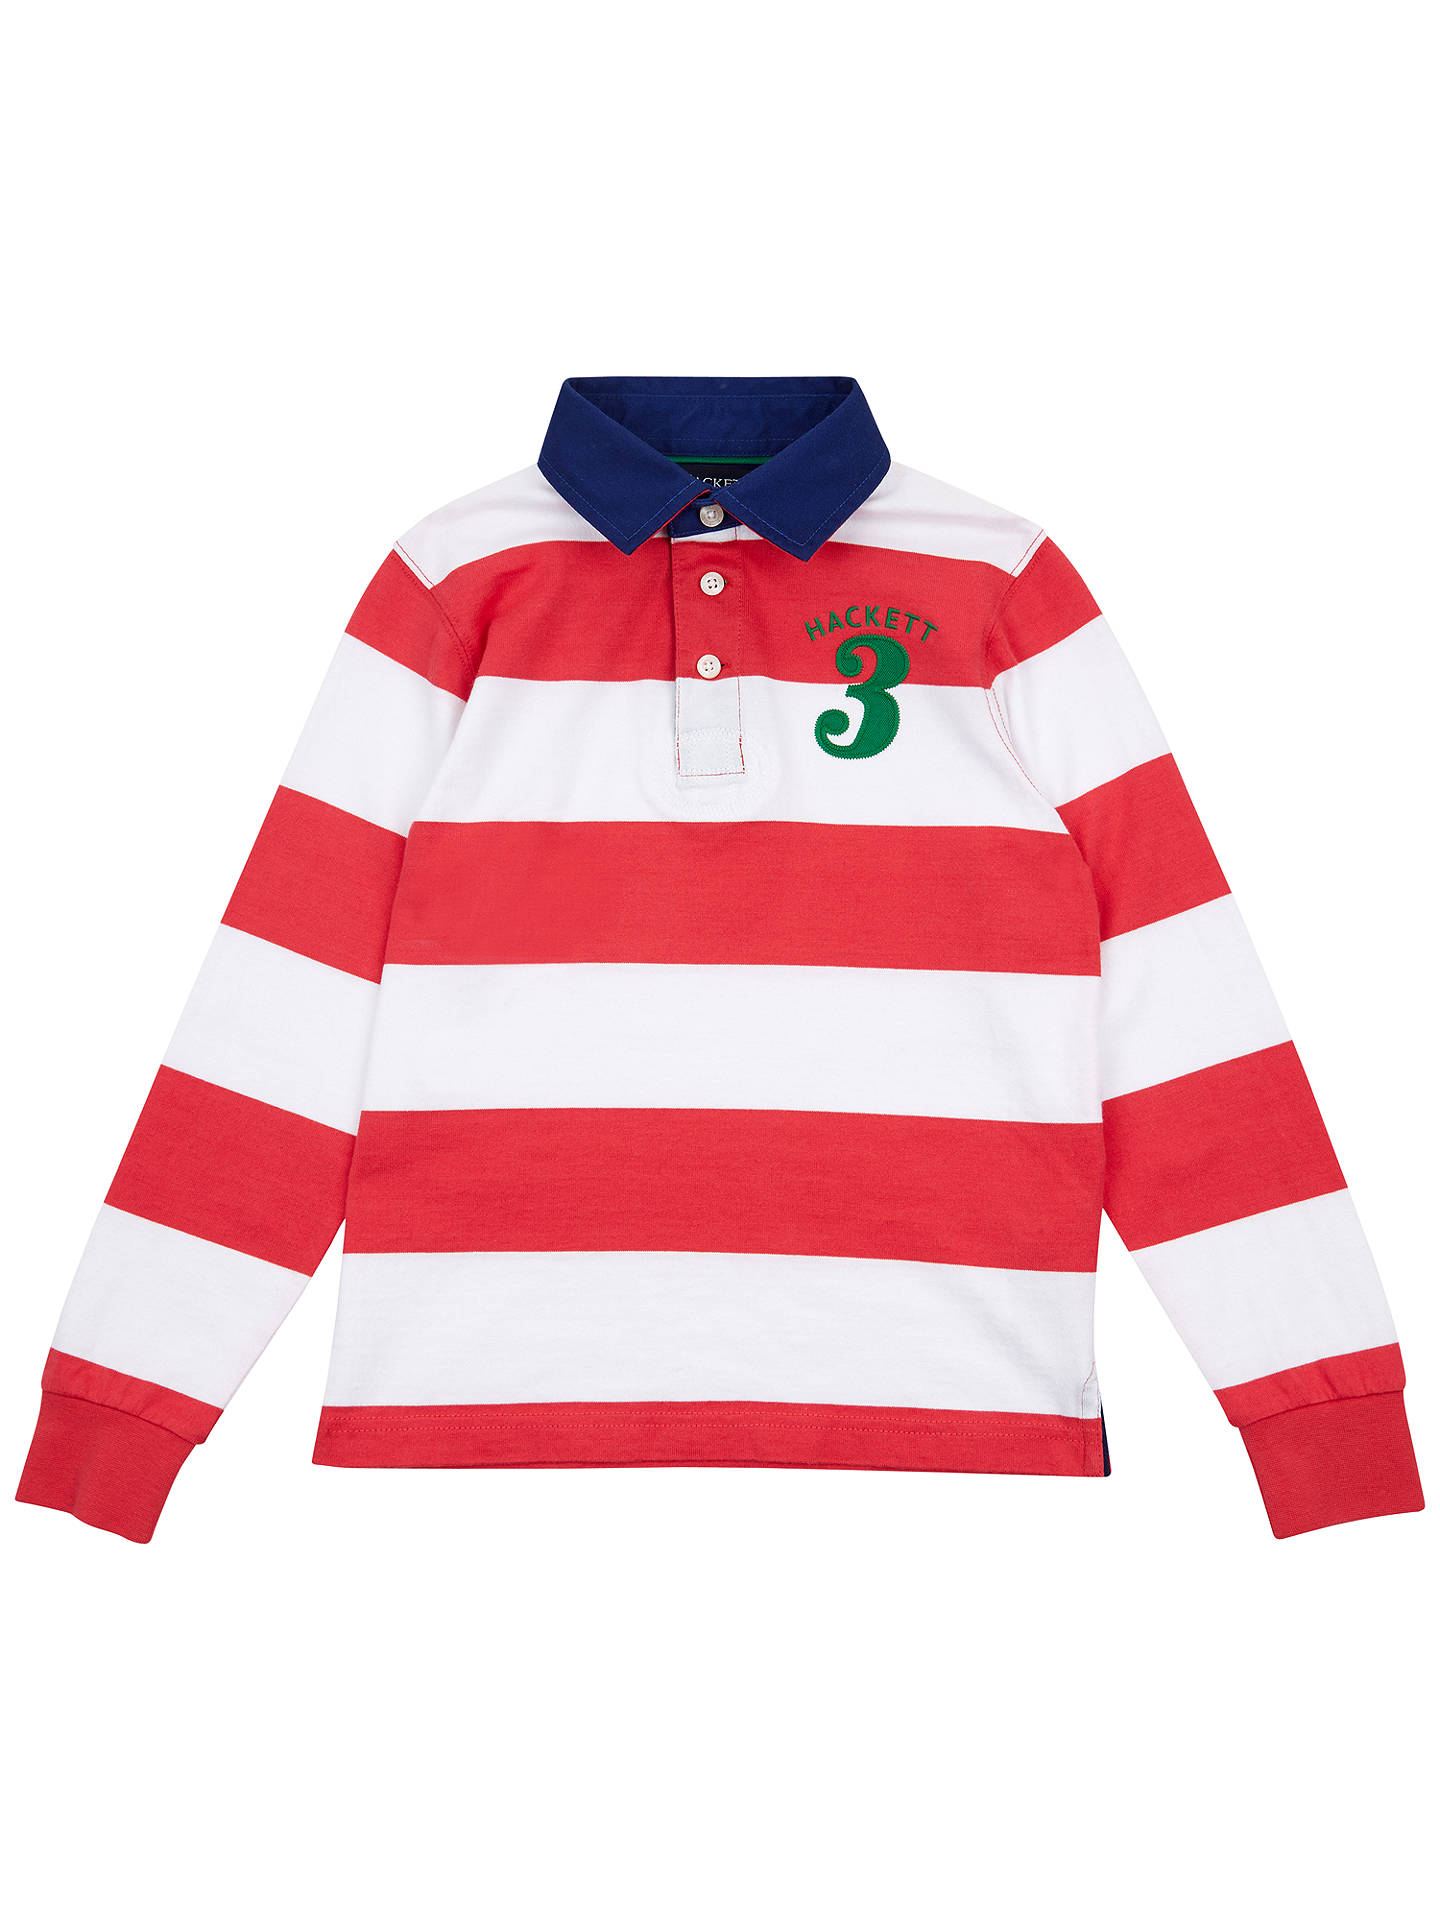 Hackett London Boys Long Sleeve Stripe Rugby Shirt Redwhite At